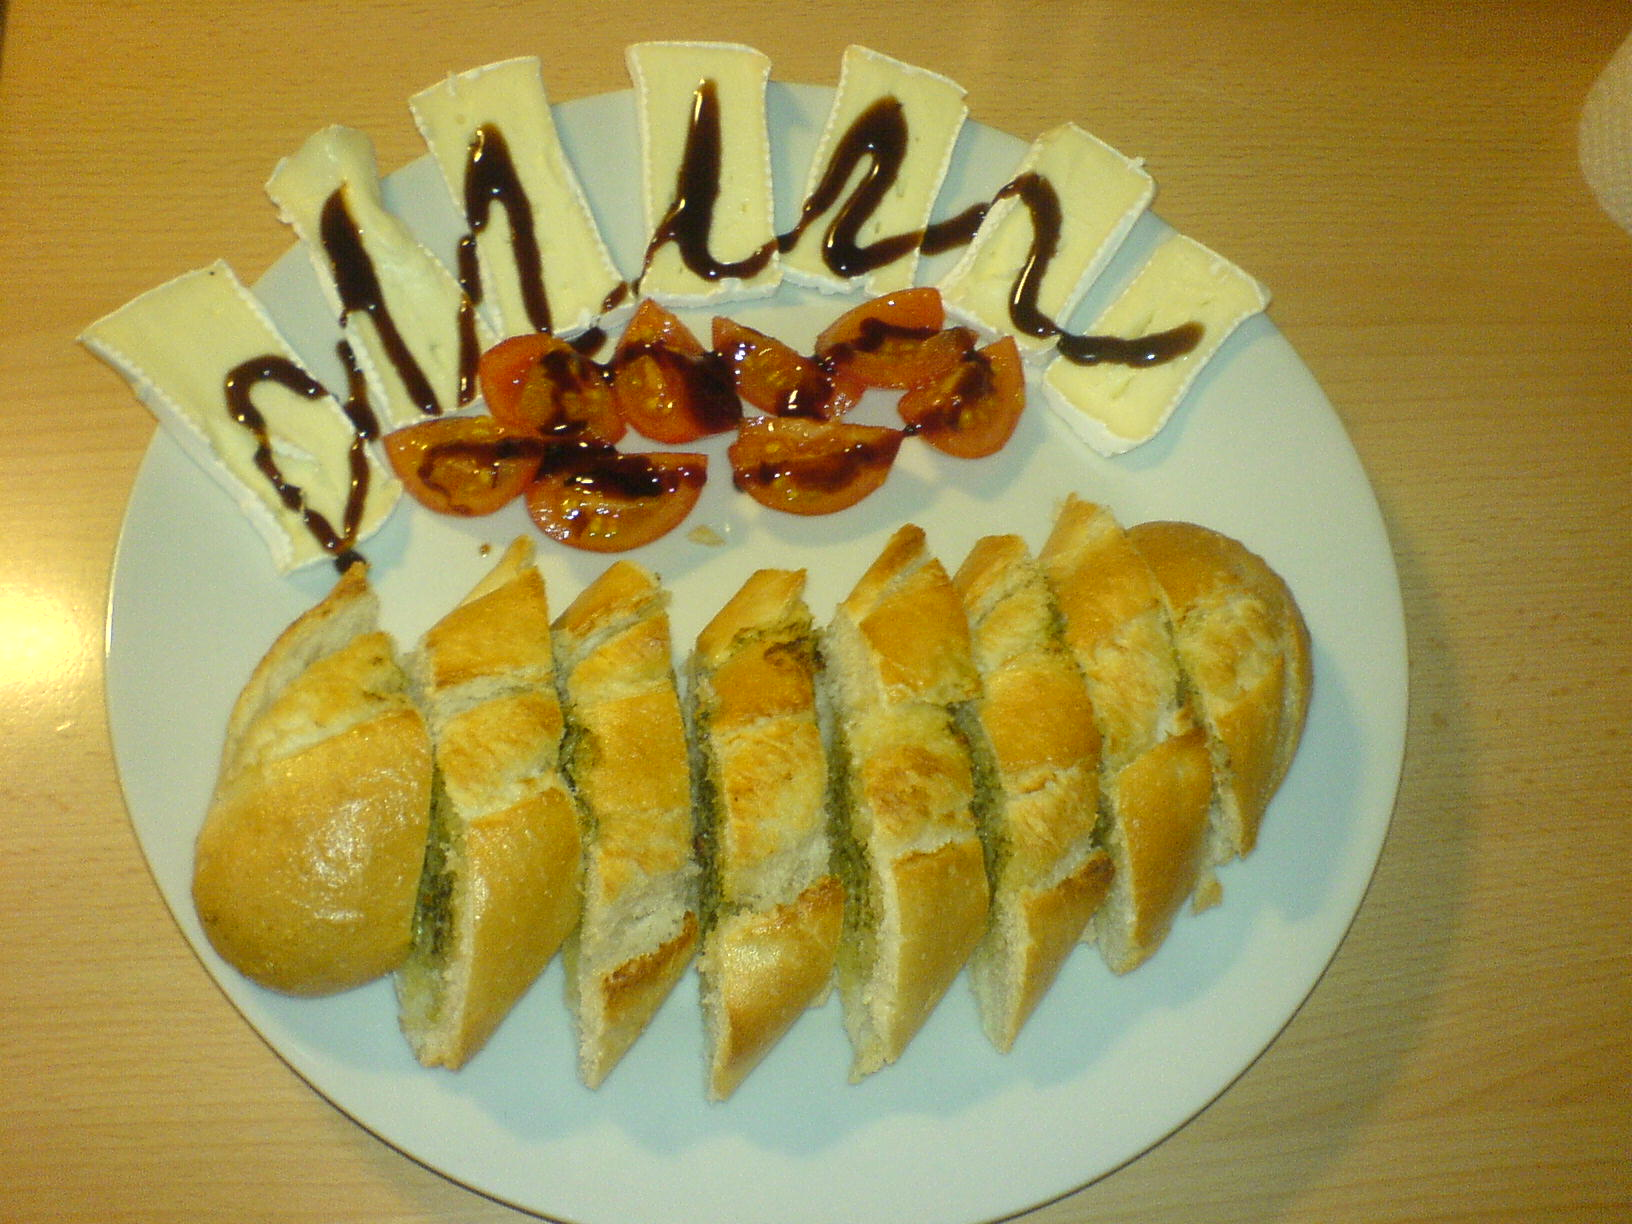 https://foodloader.net/Holz_2010-01-23_Kraeuterbaguette_mit_Camembert_und_Tomaten.jpg